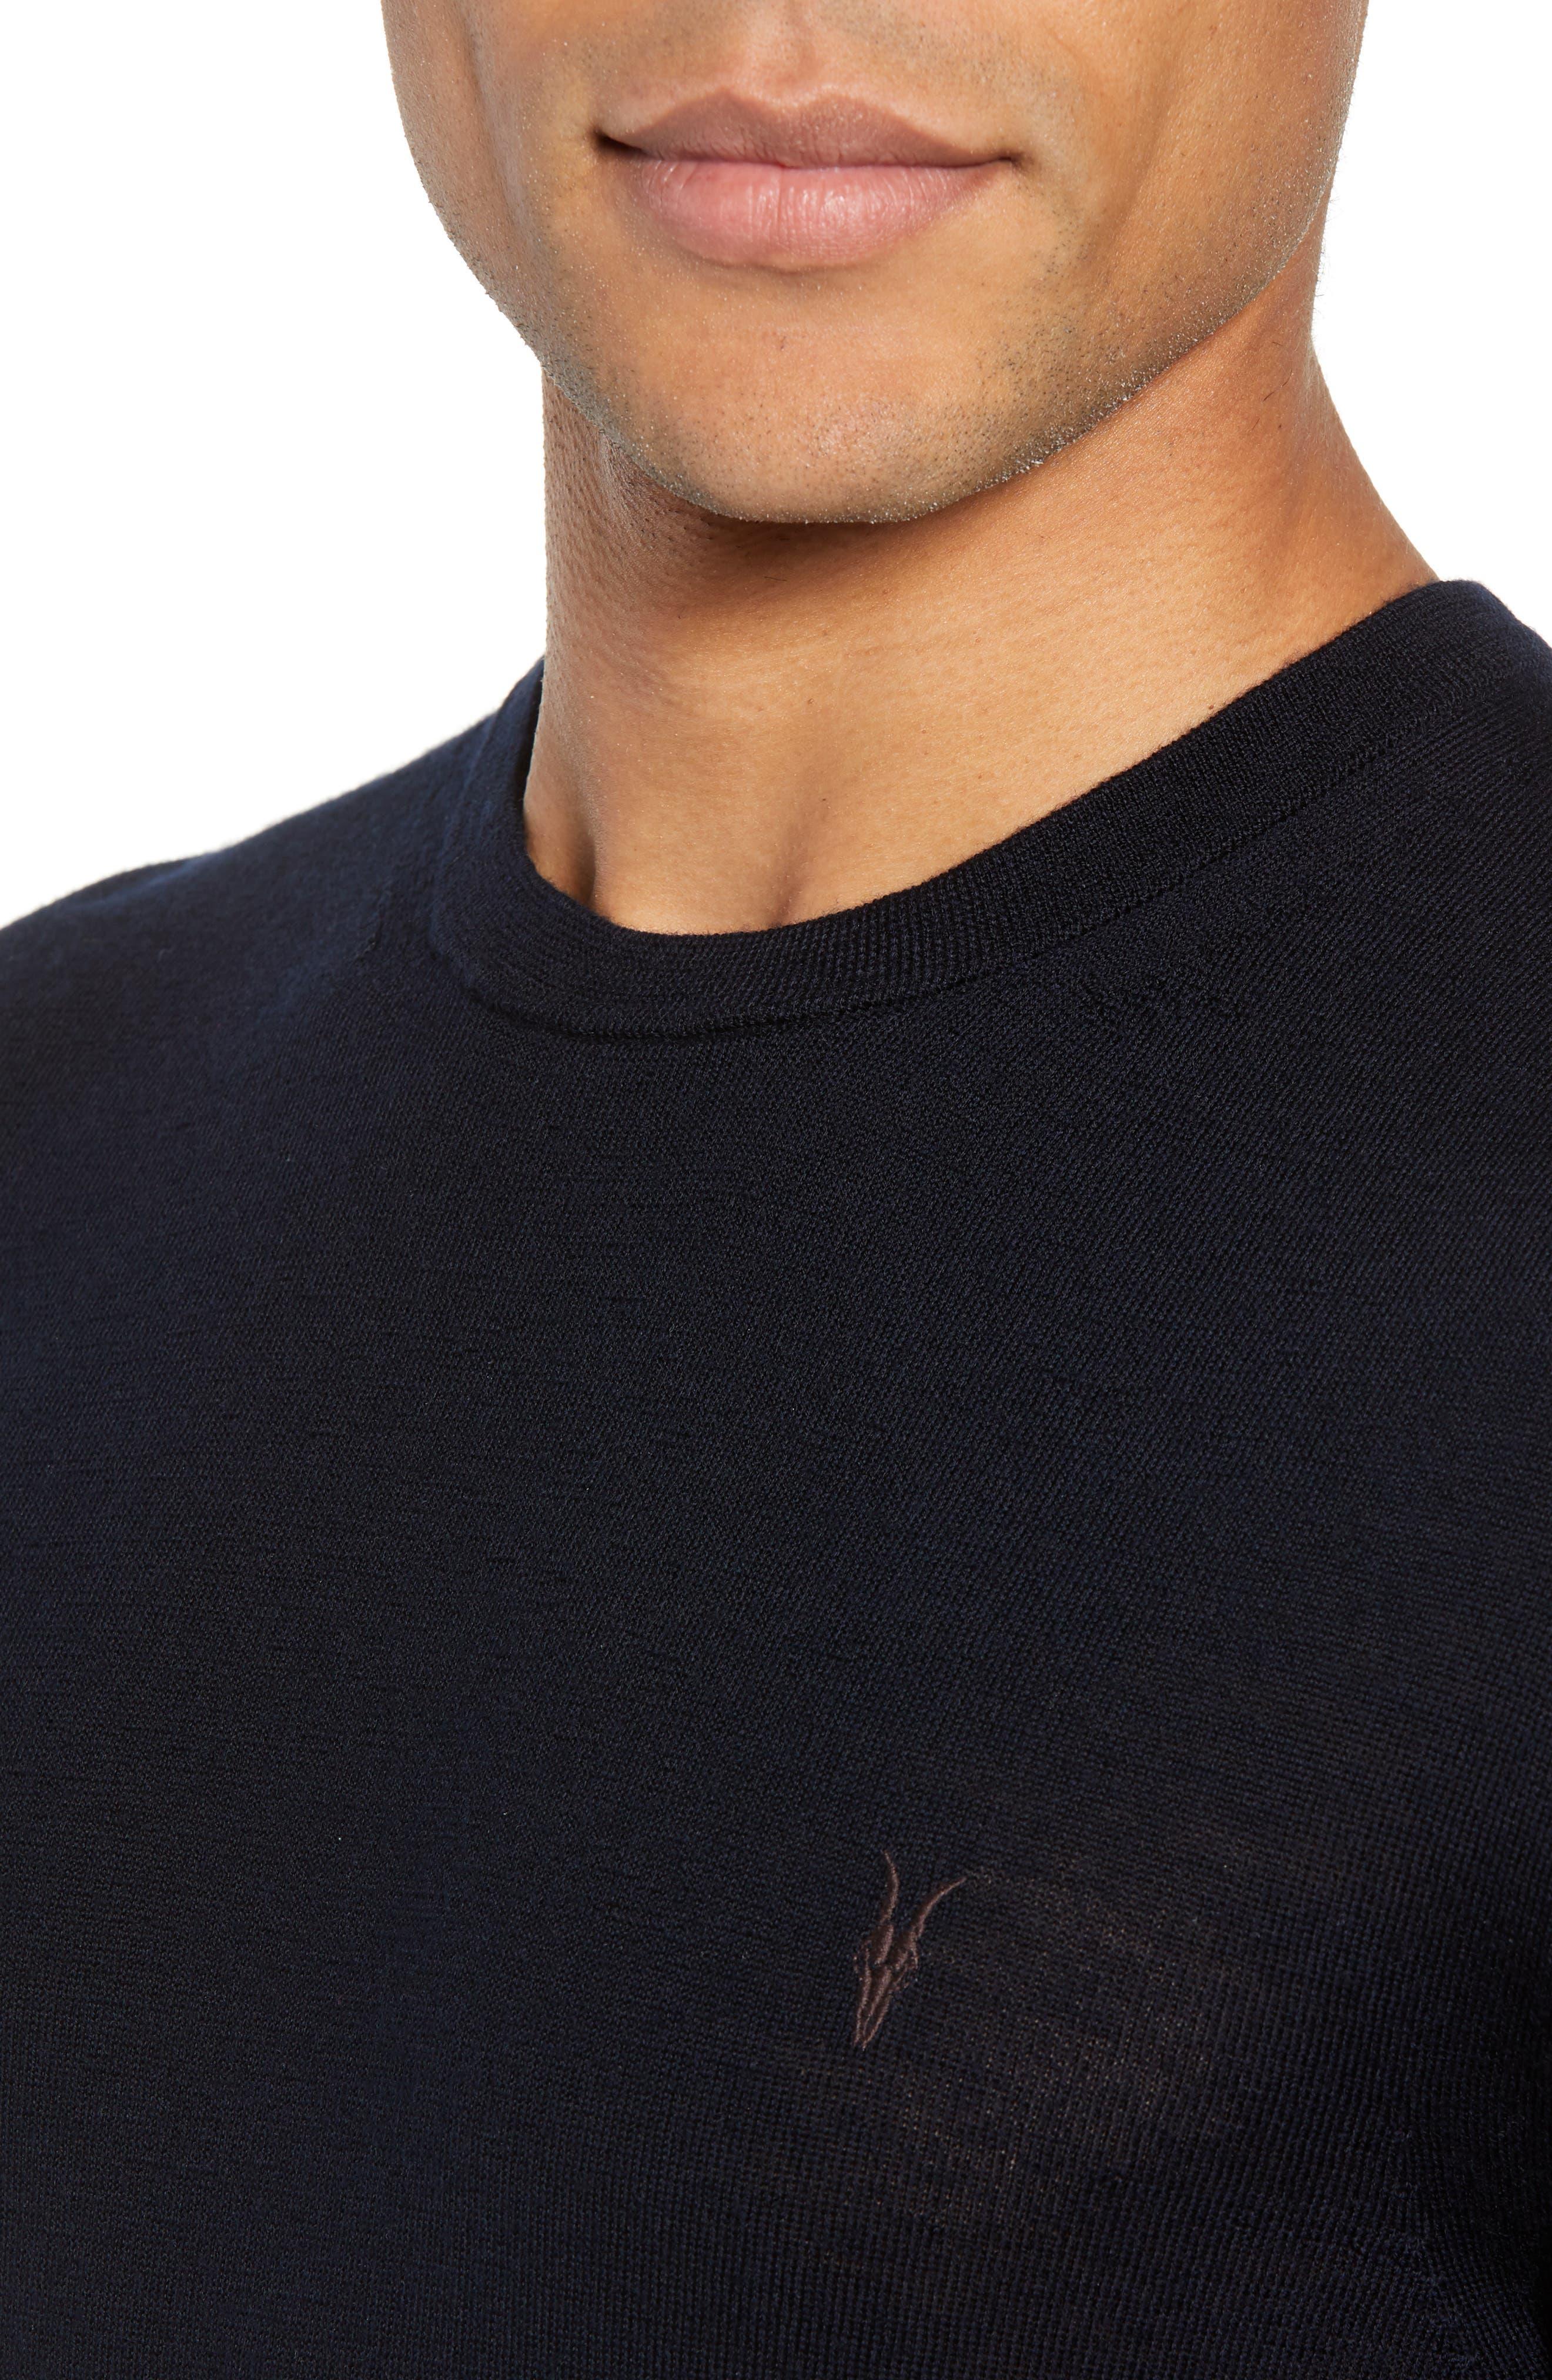 Mode Slim Fit Merino Wool Sweater,                             Alternate thumbnail 27, color,